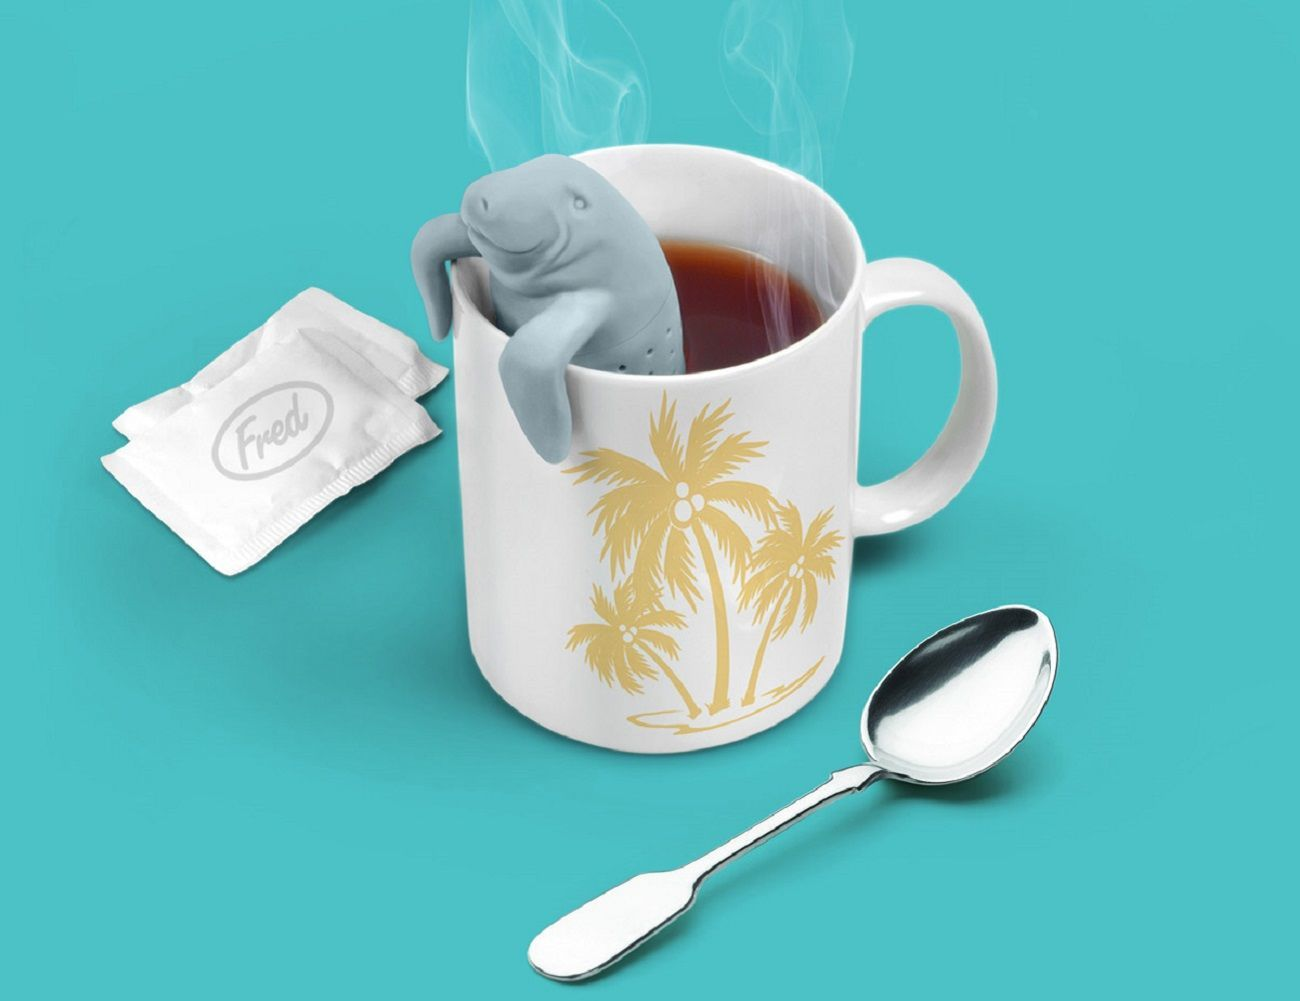 Manatea+Tea+Infuser